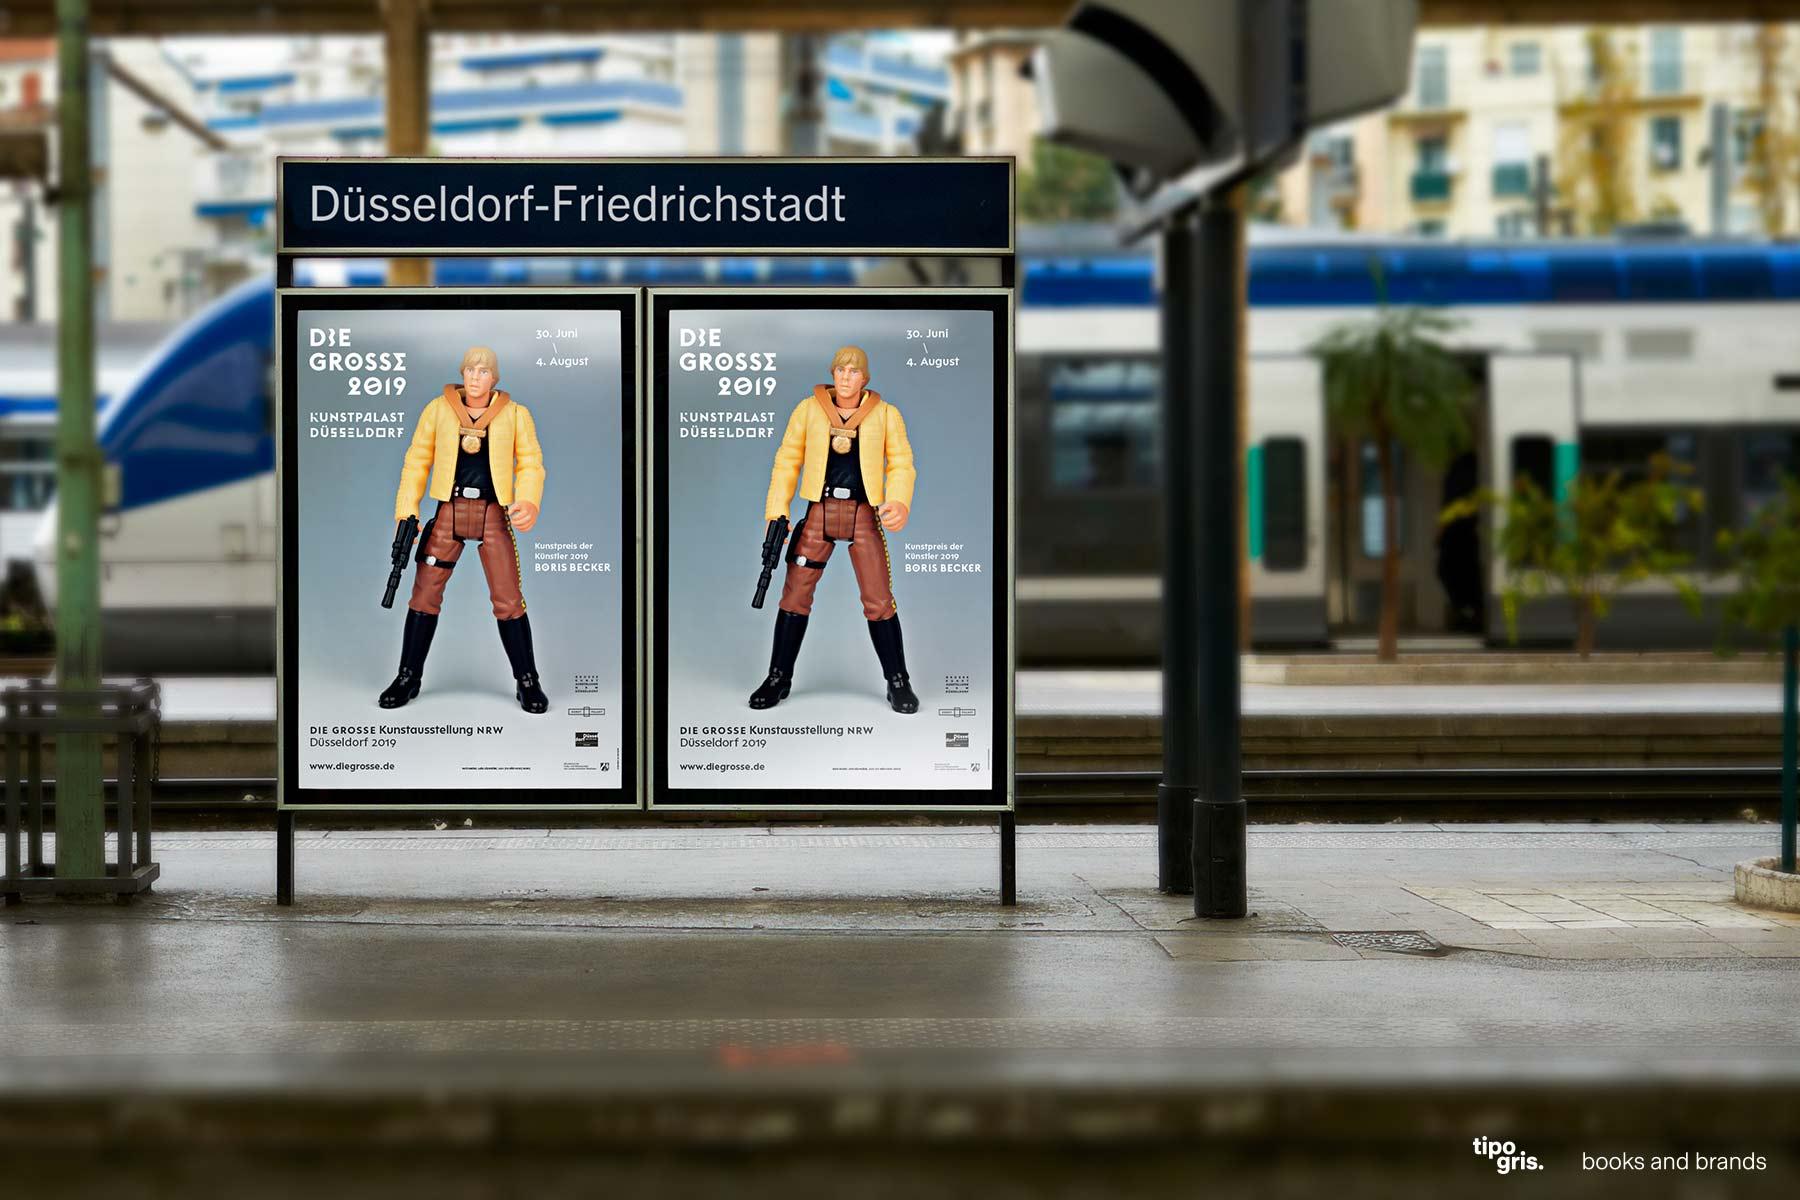 diegrosse-2019_pre-outdoor_01_luke-clp